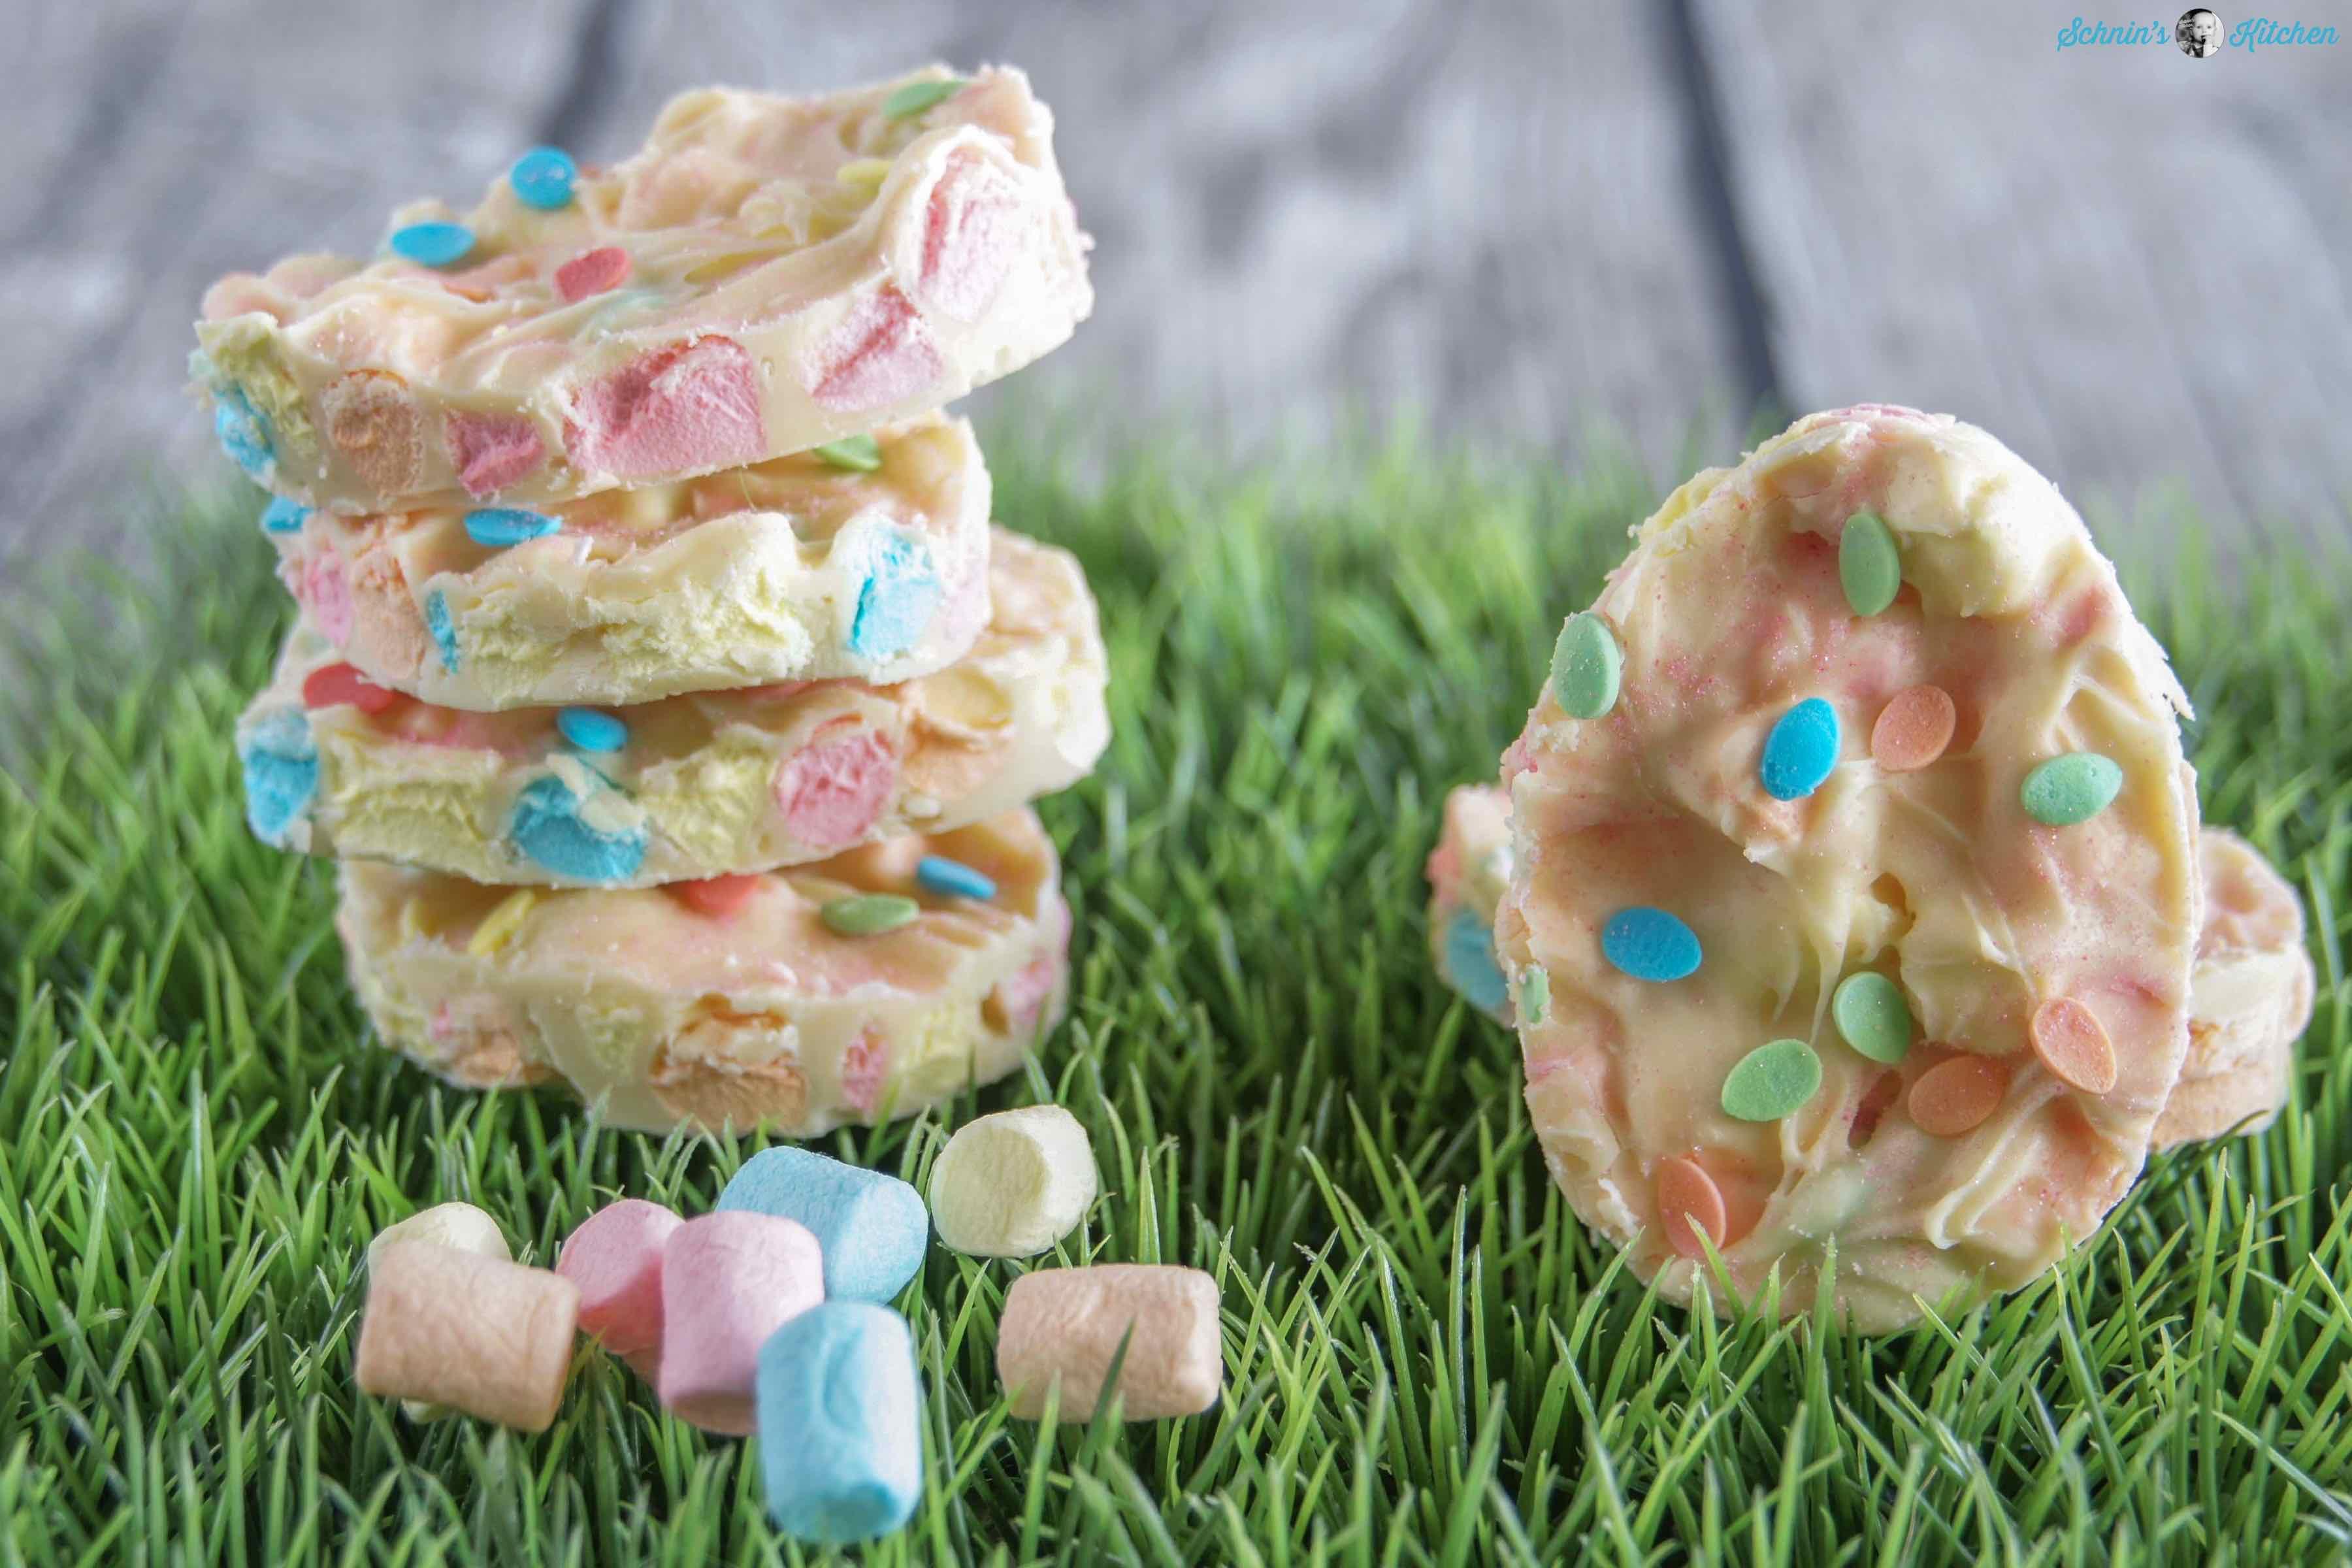 Marshmallow-Osterschokolade selber machen | www.schninskitchen.de